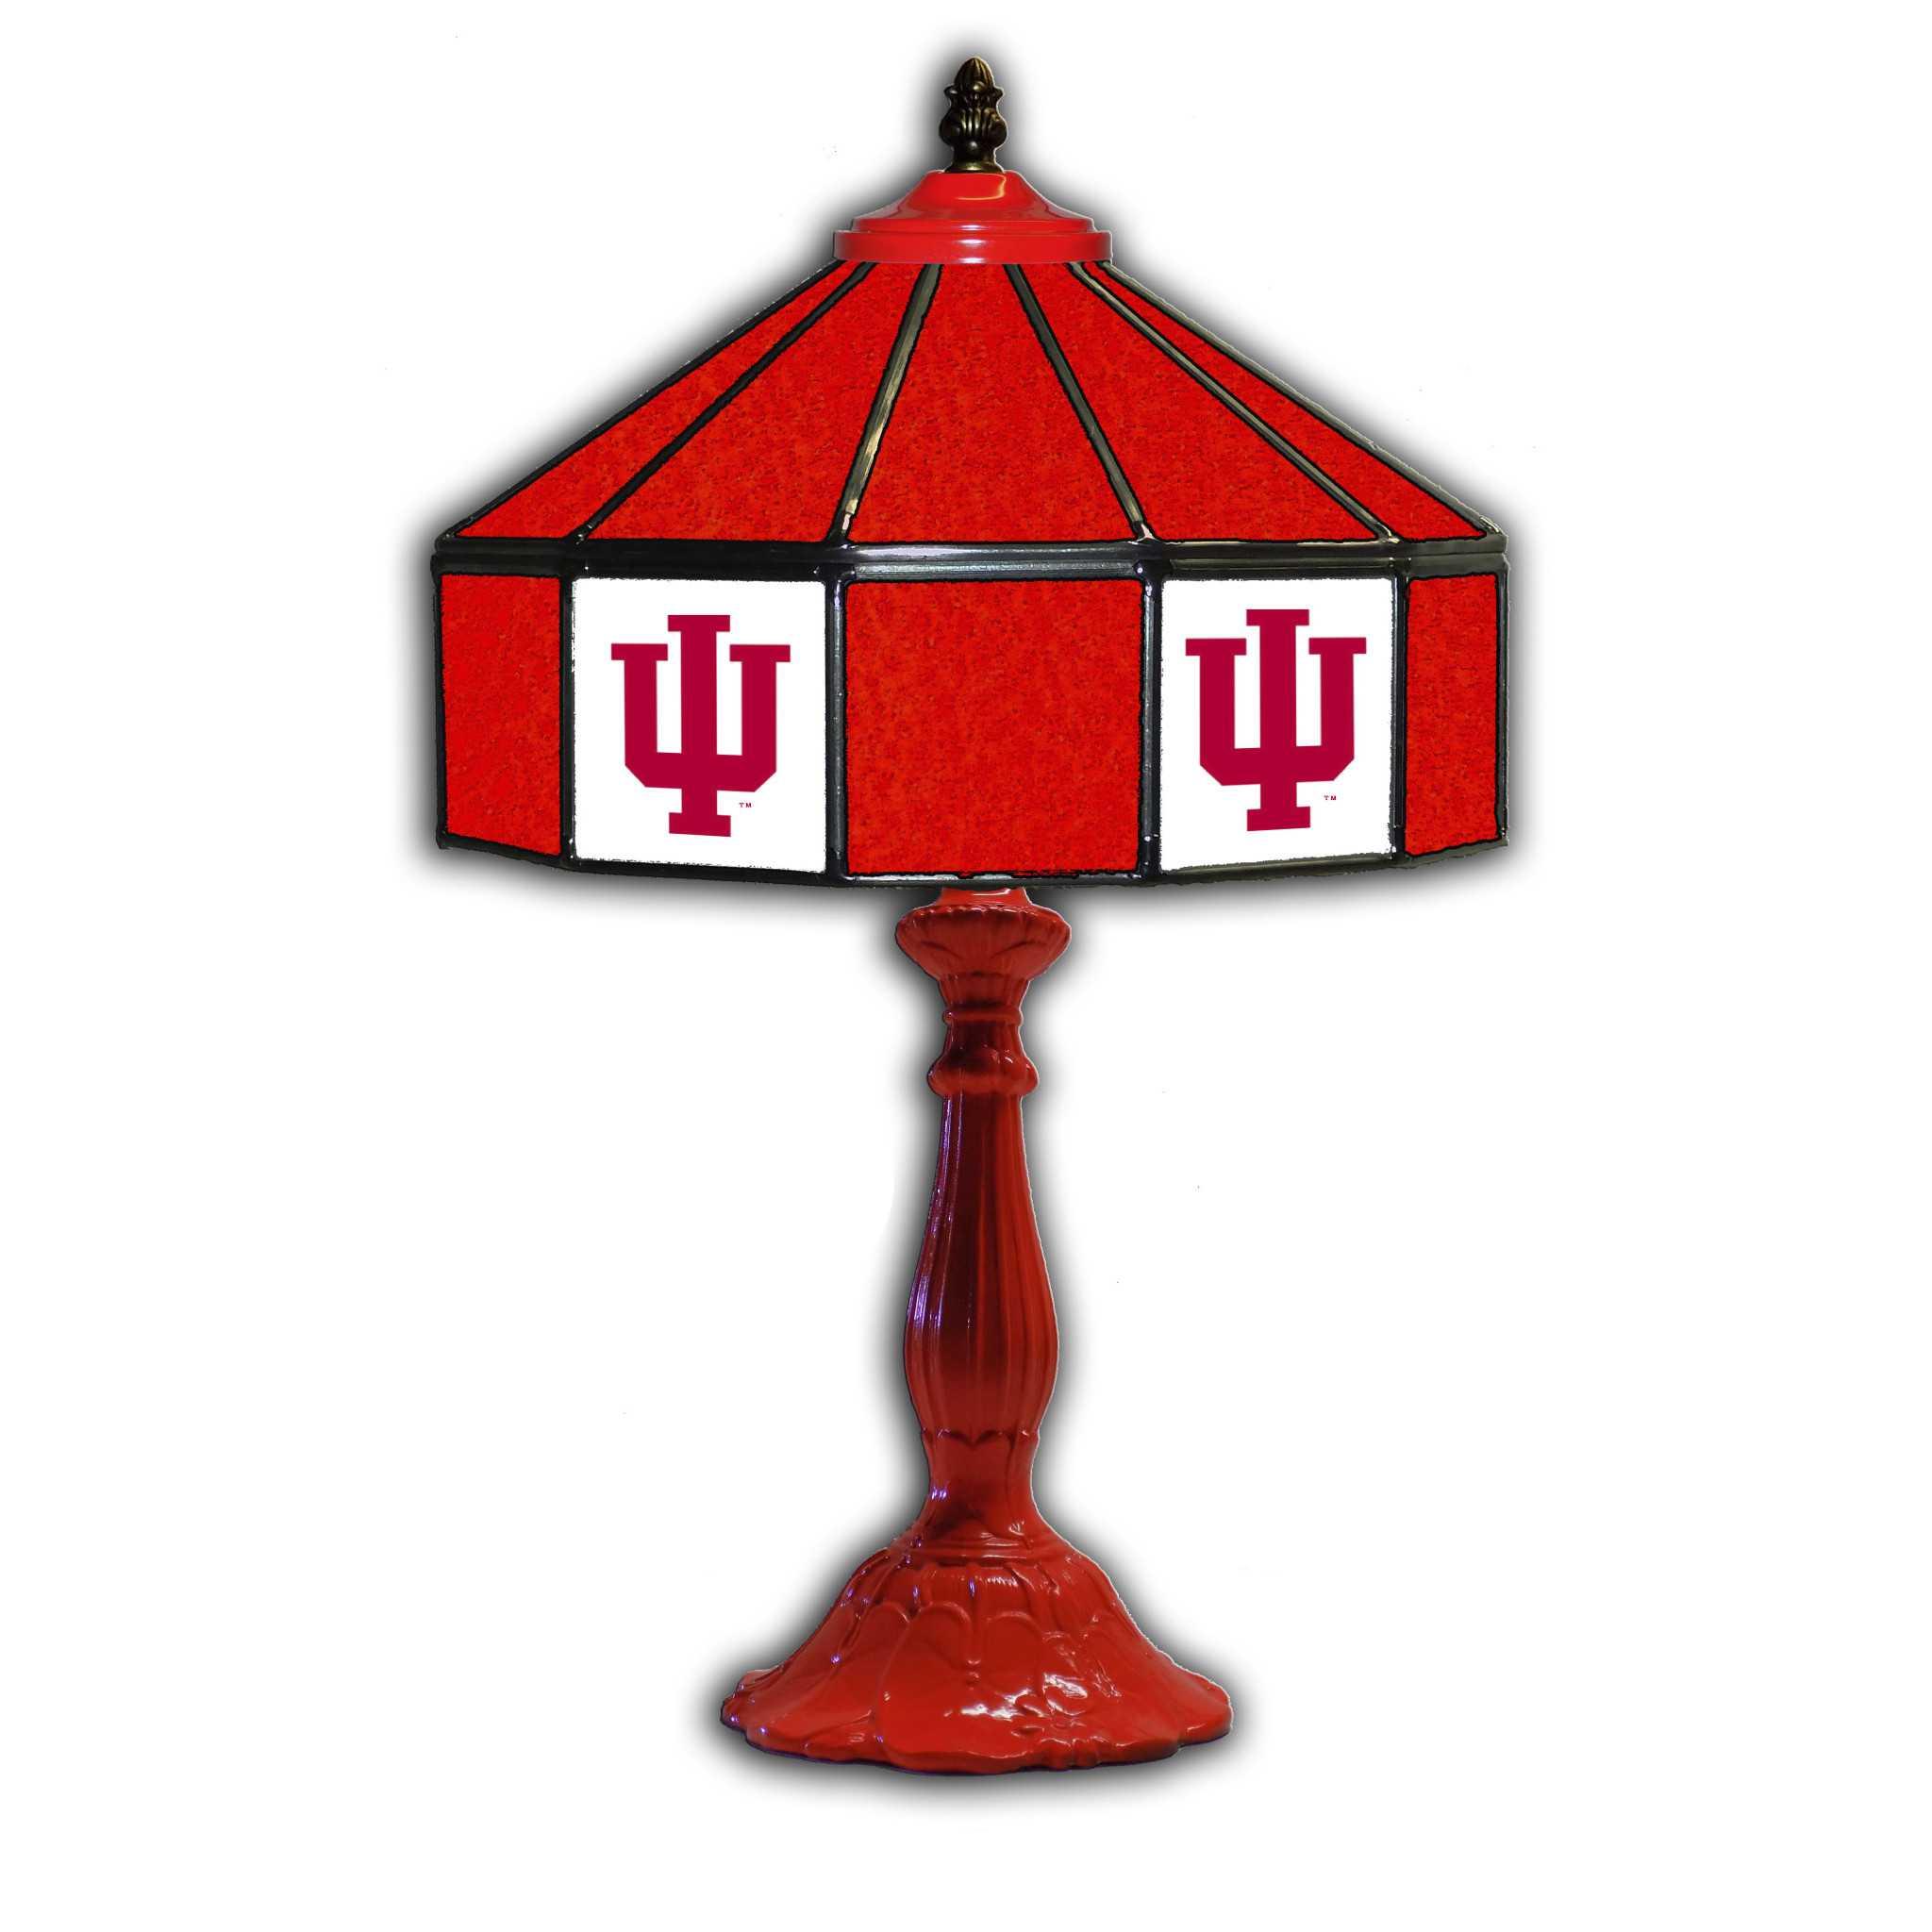 "INDIANA UNIVERSITY 21"" GLASS LAMP"